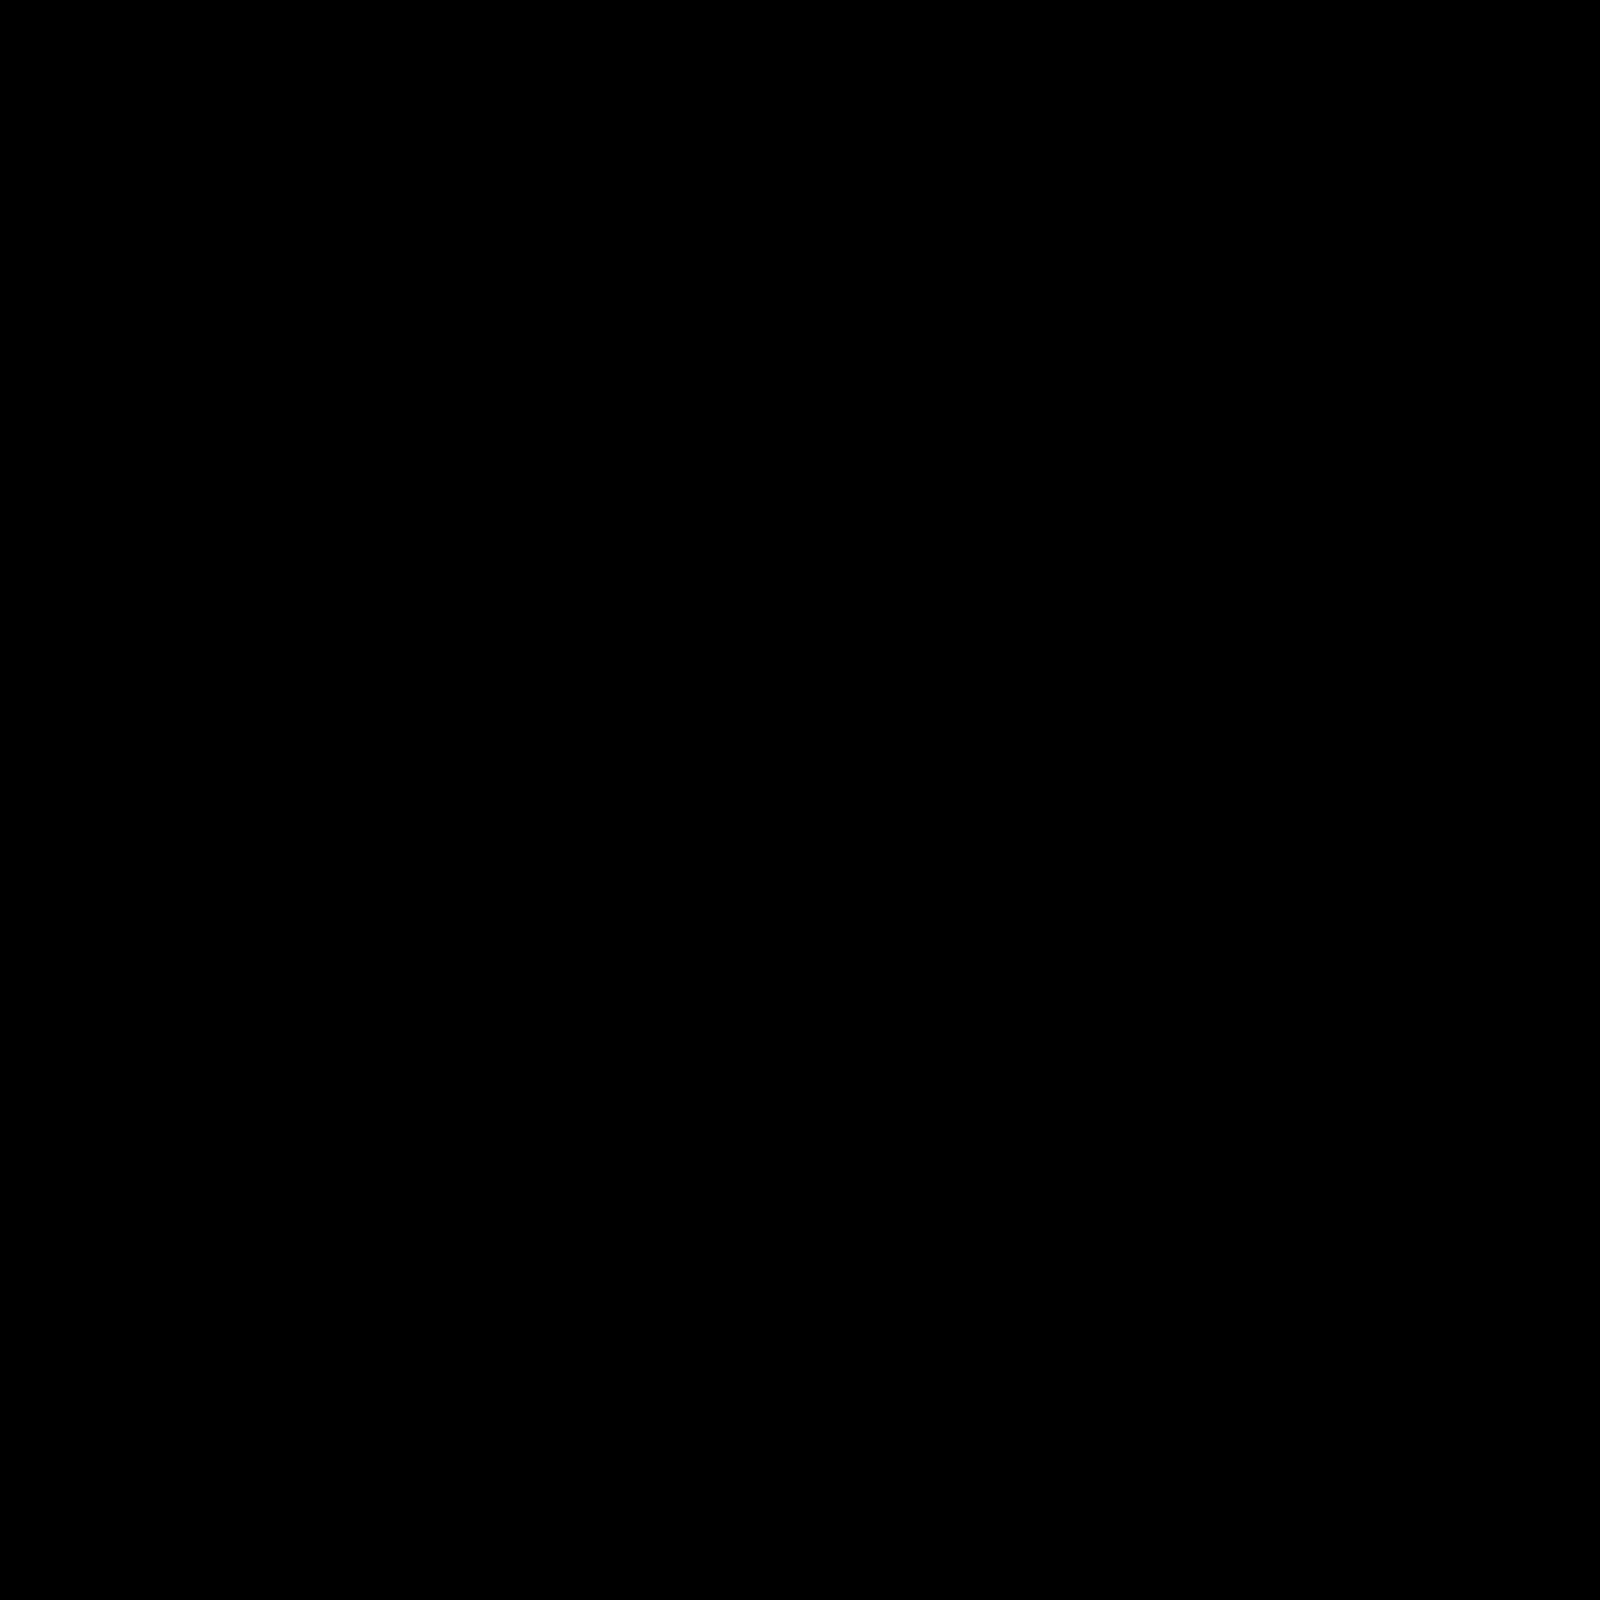 3D回転 icon